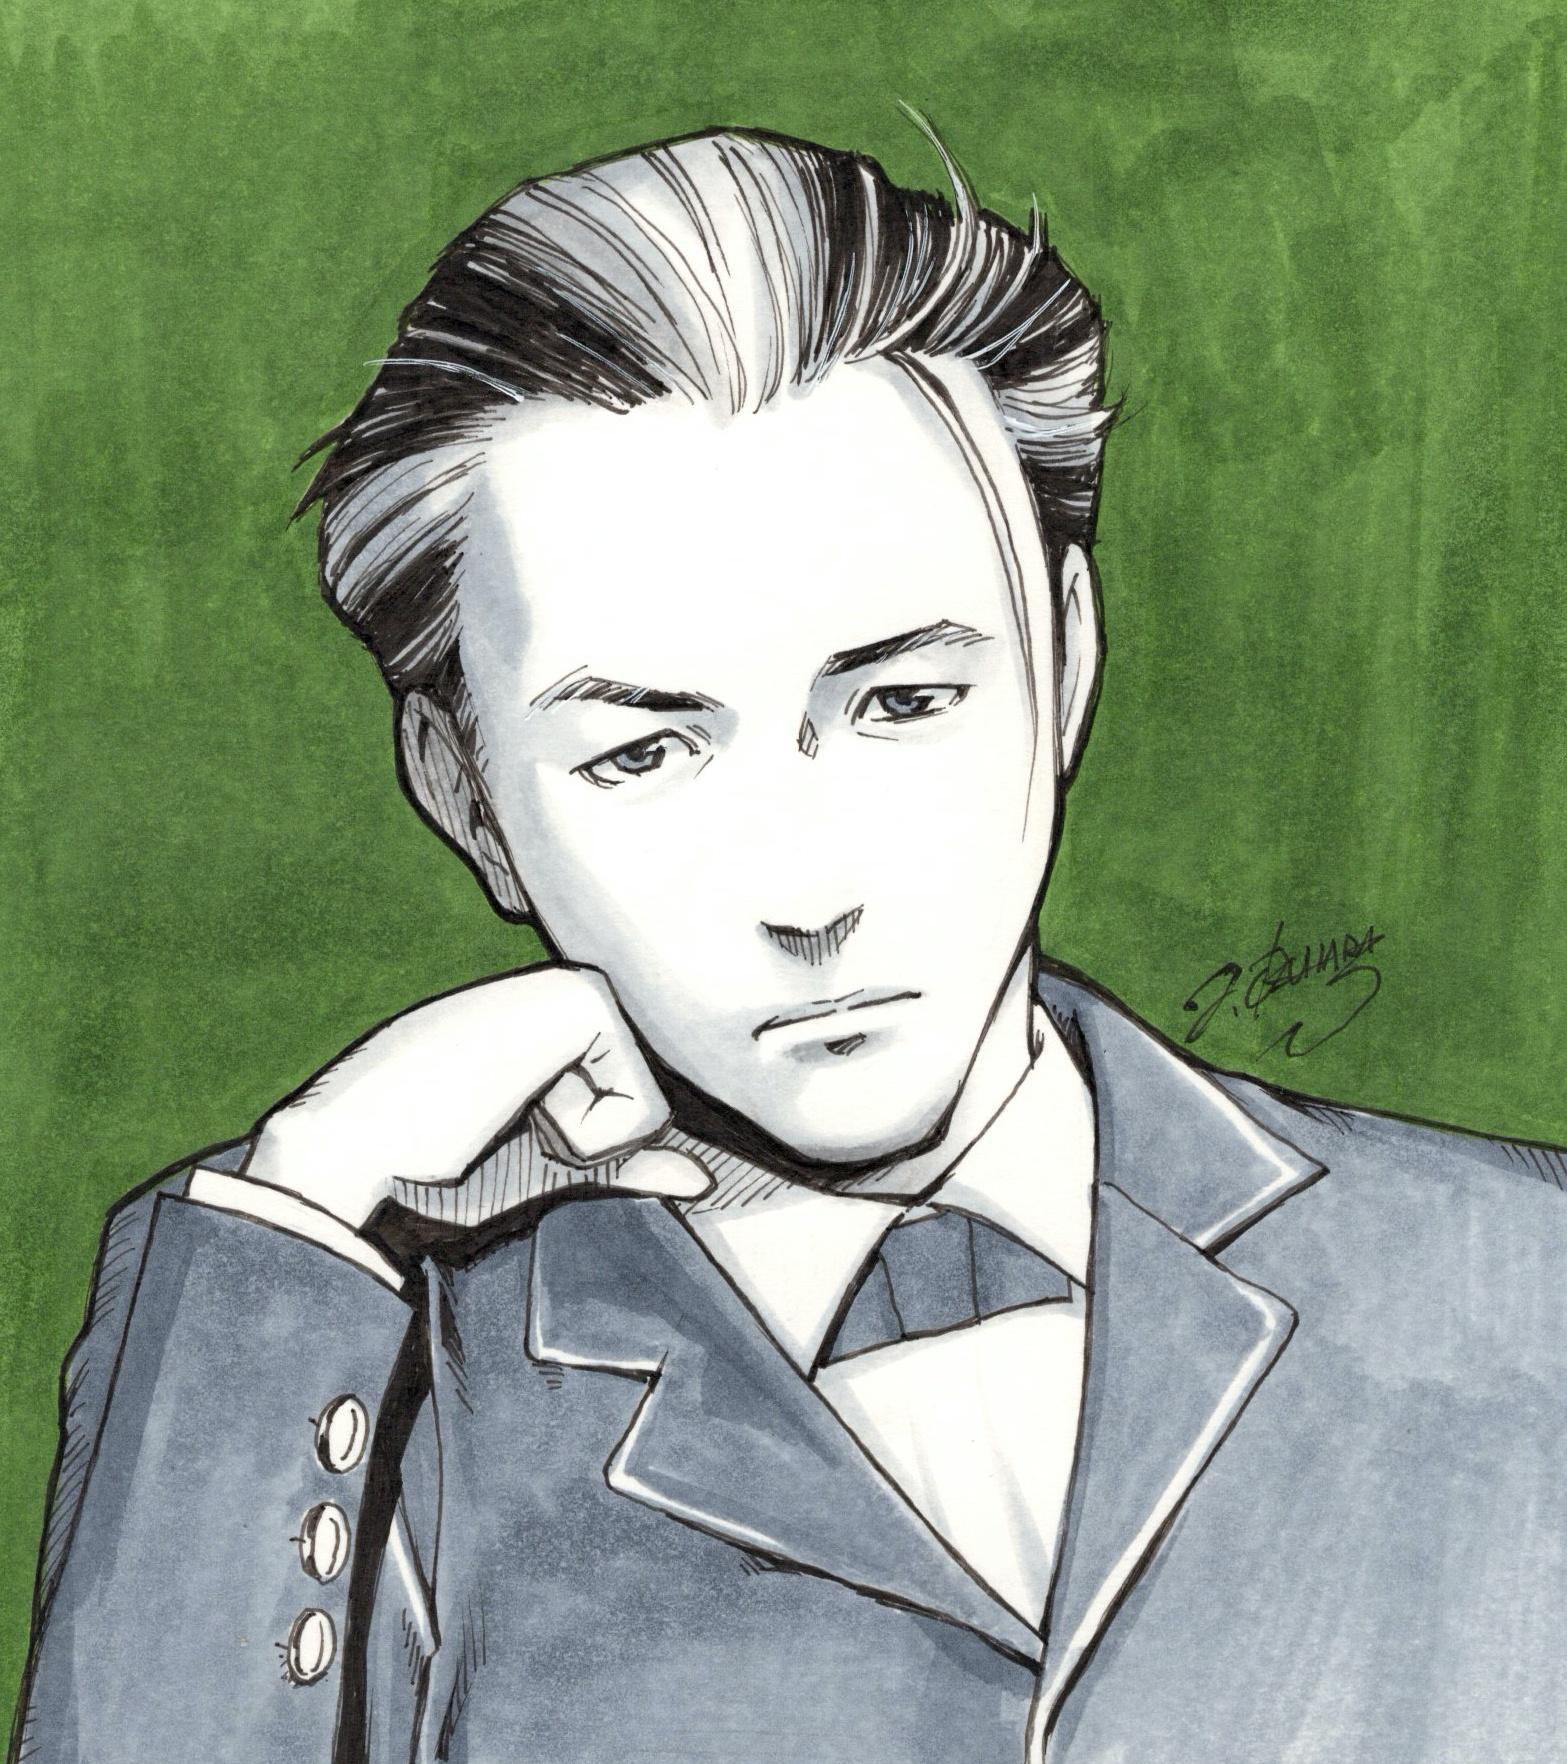 The Reiwa Arrange Portrait: Eiichi Shibusawa/渋沢栄一